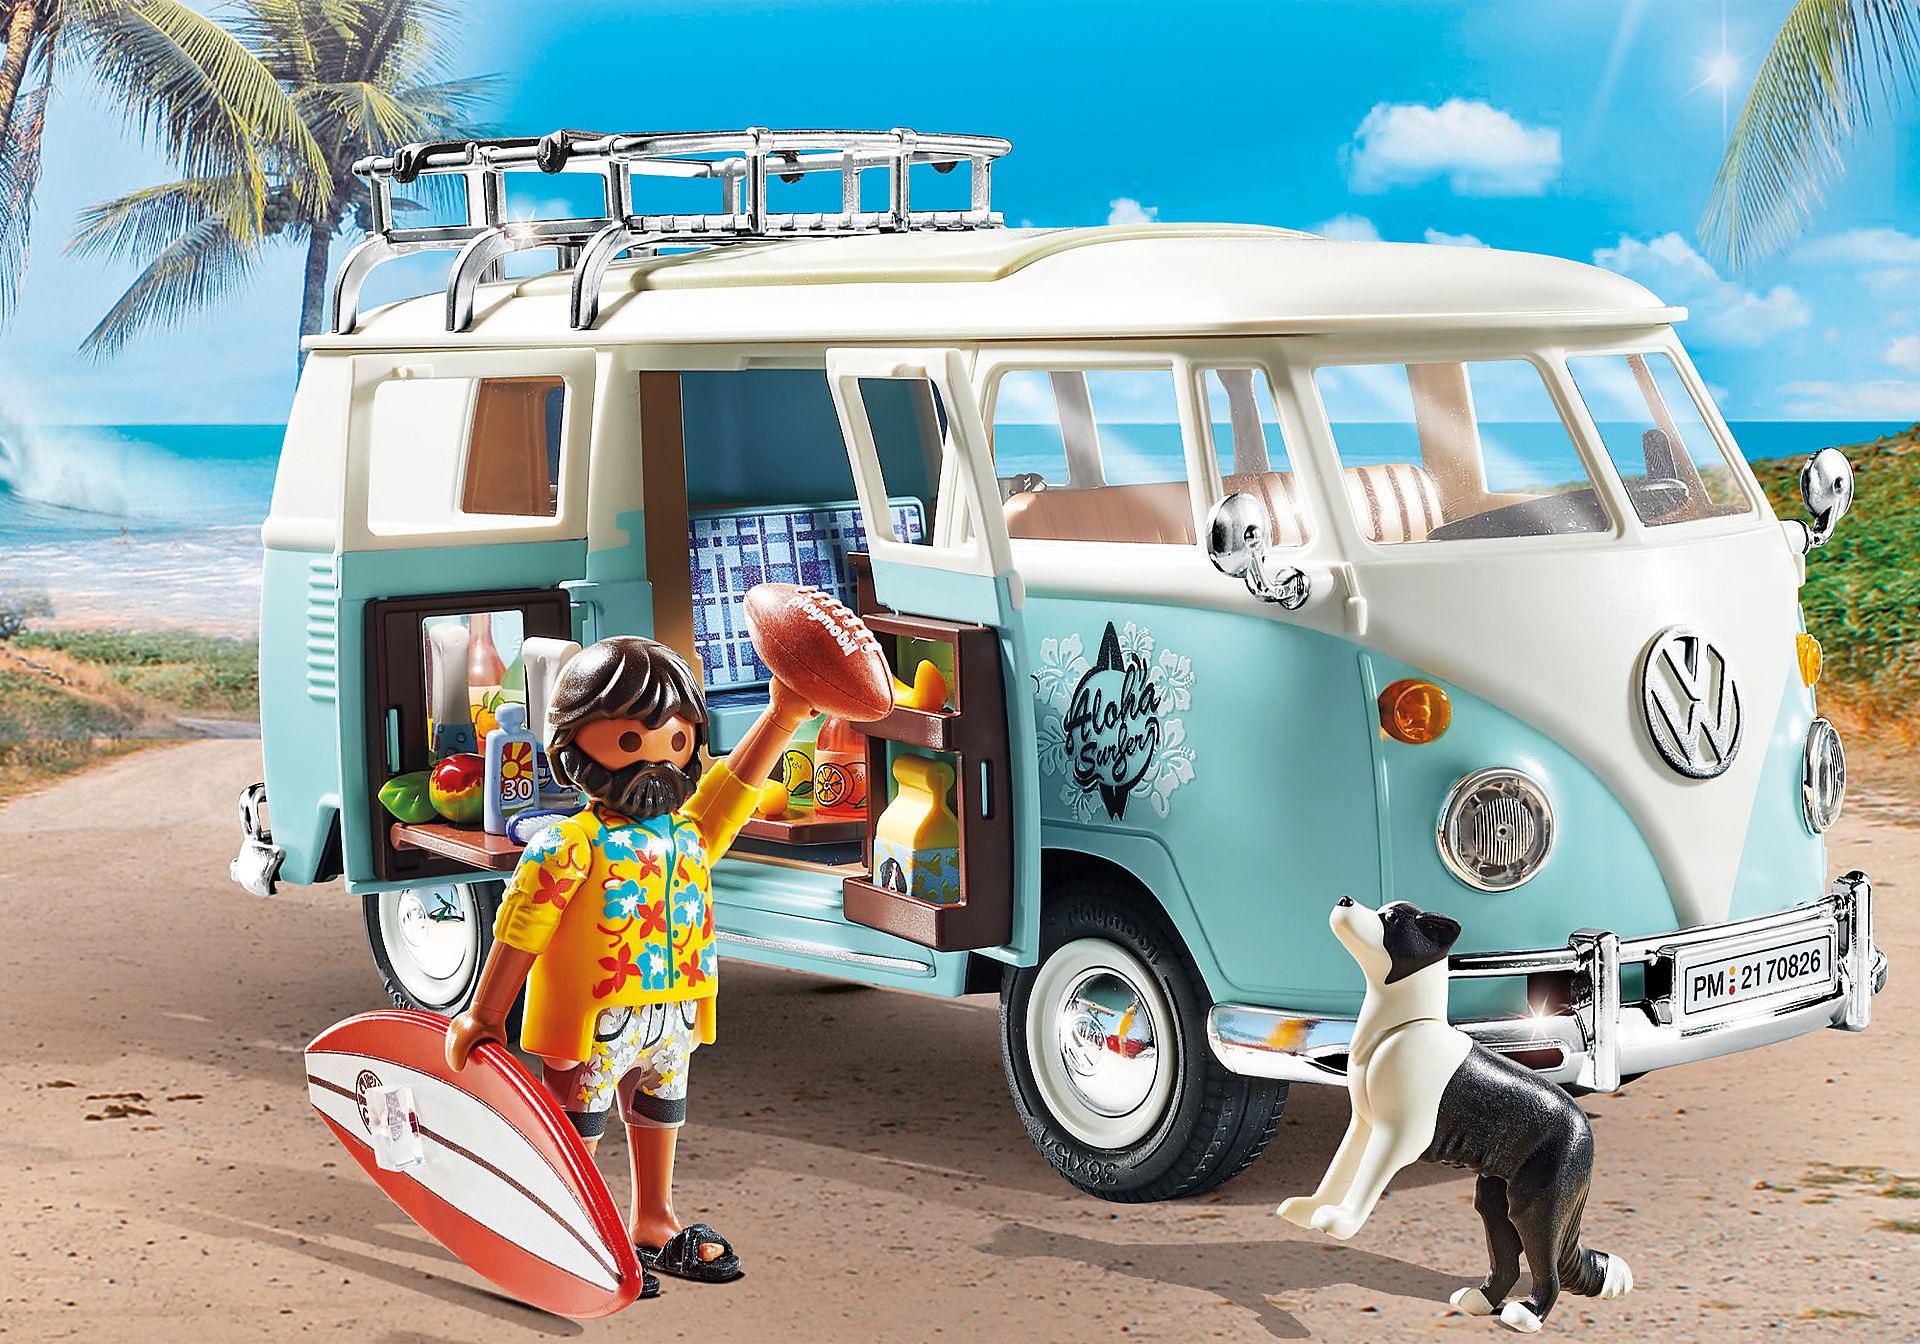 70826 Volkswagen T1 Camping Bus - Edycja specjalna zoom image6